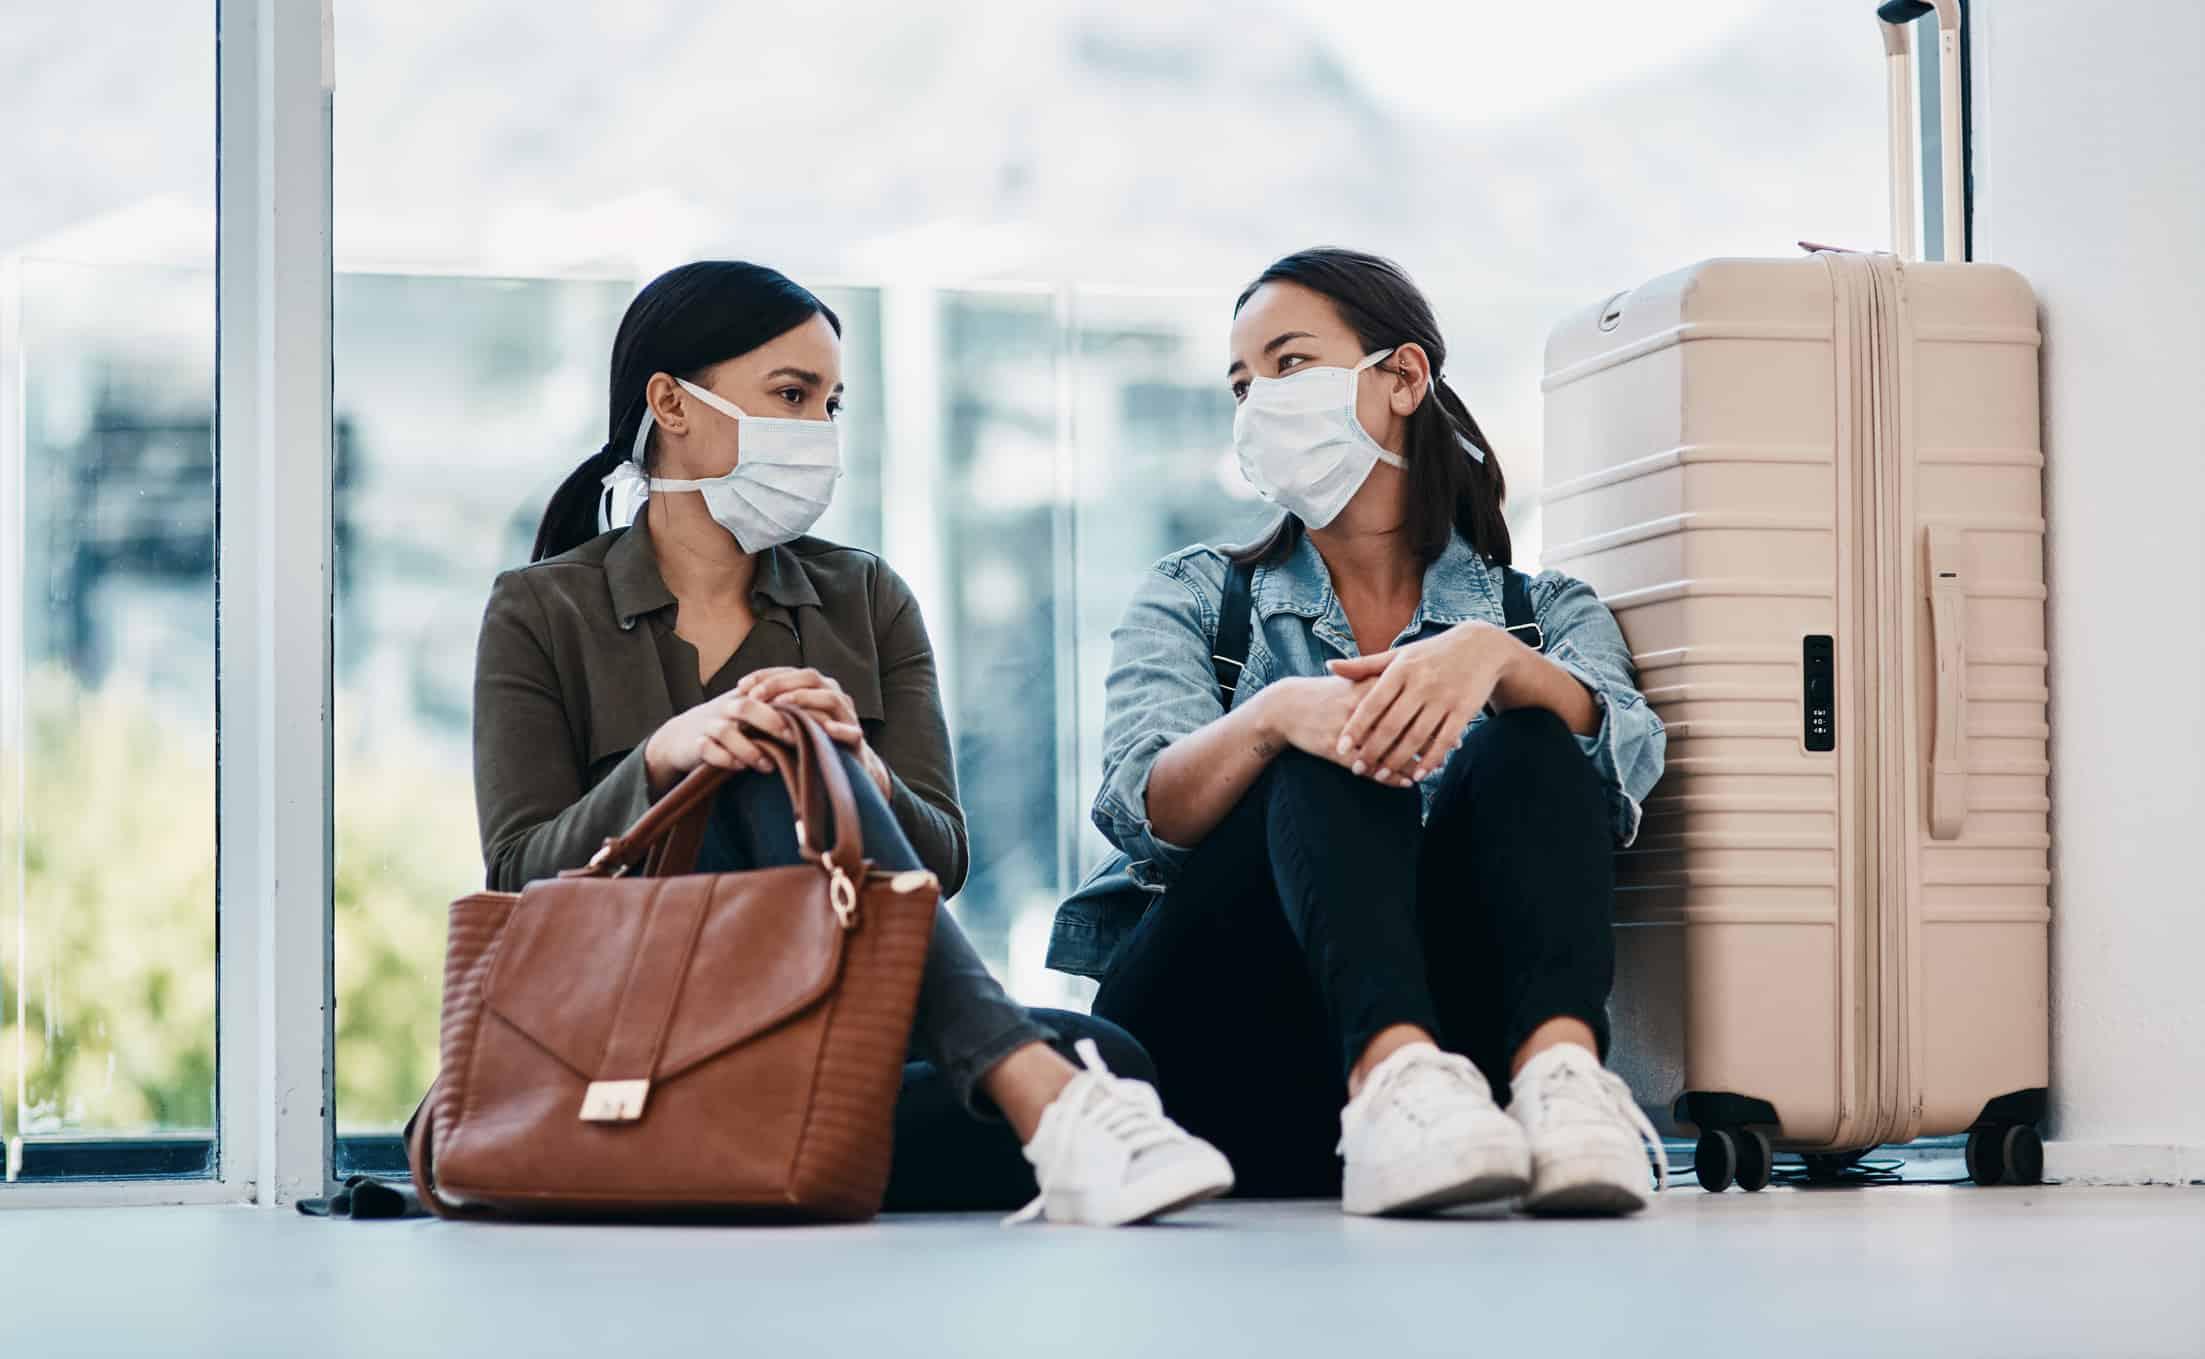 Can Employers Limit Employee Travel During Coronavirus?